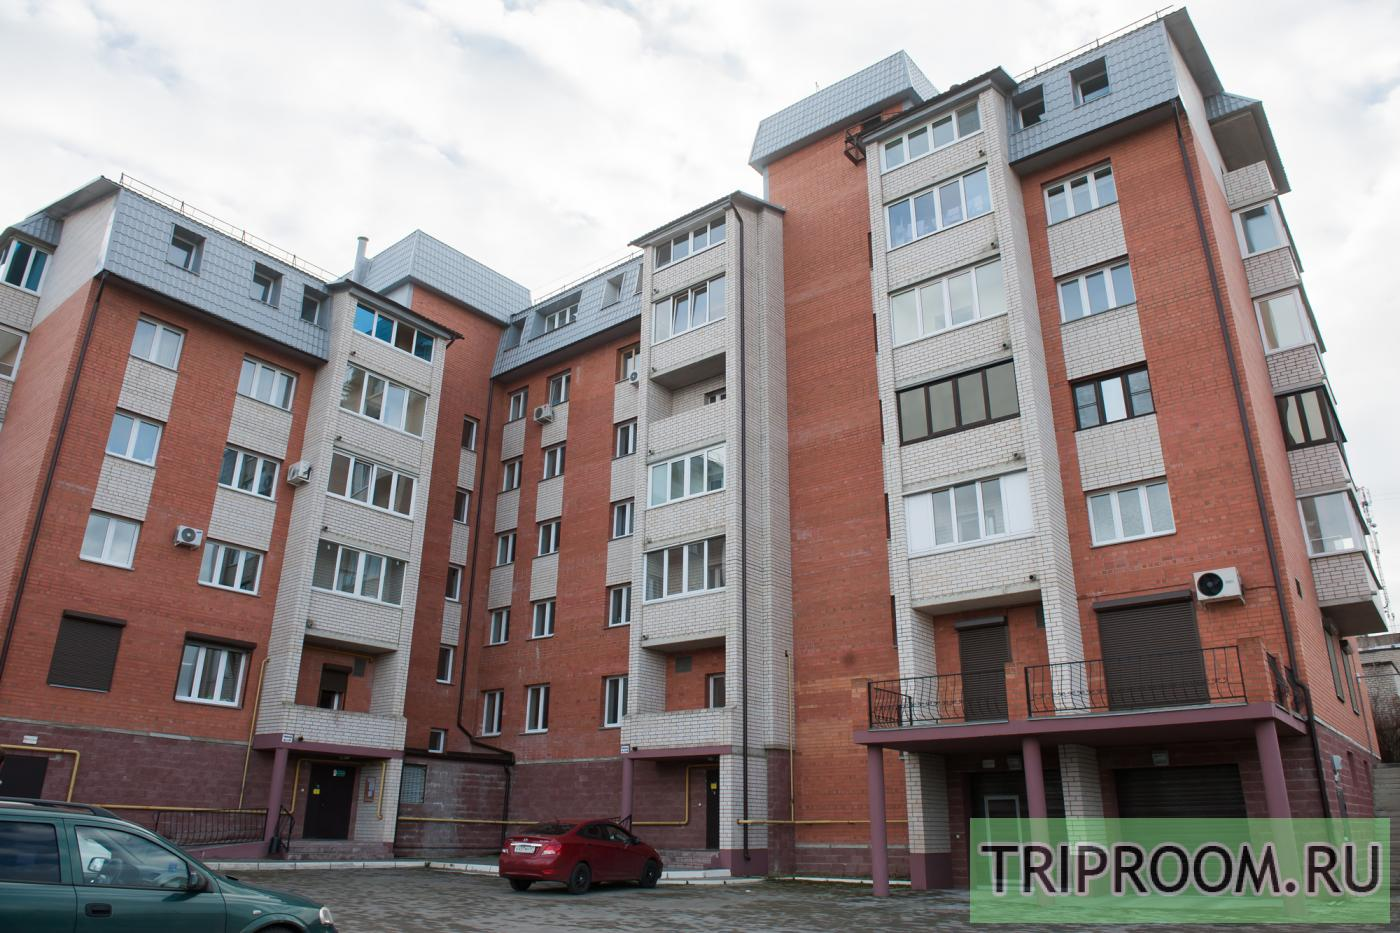 2-комнатная квартира посуточно (вариант № 12765), ул. Кронштадский переулок, фото № 11